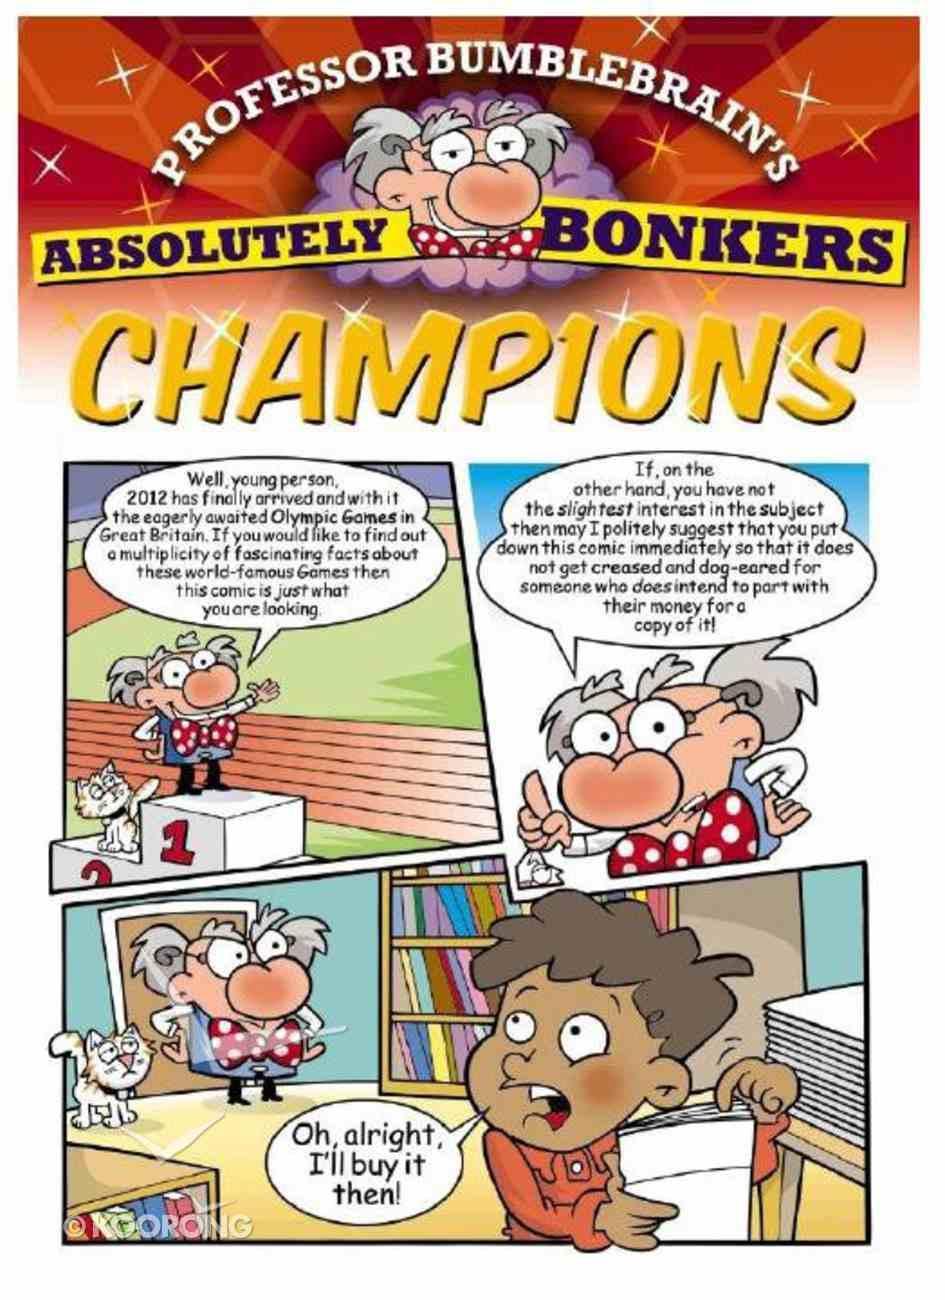 Champions - Kingdom Komics (10 Pack) (Professor Bumblebrain Absolutely Bonkers Series) Pack